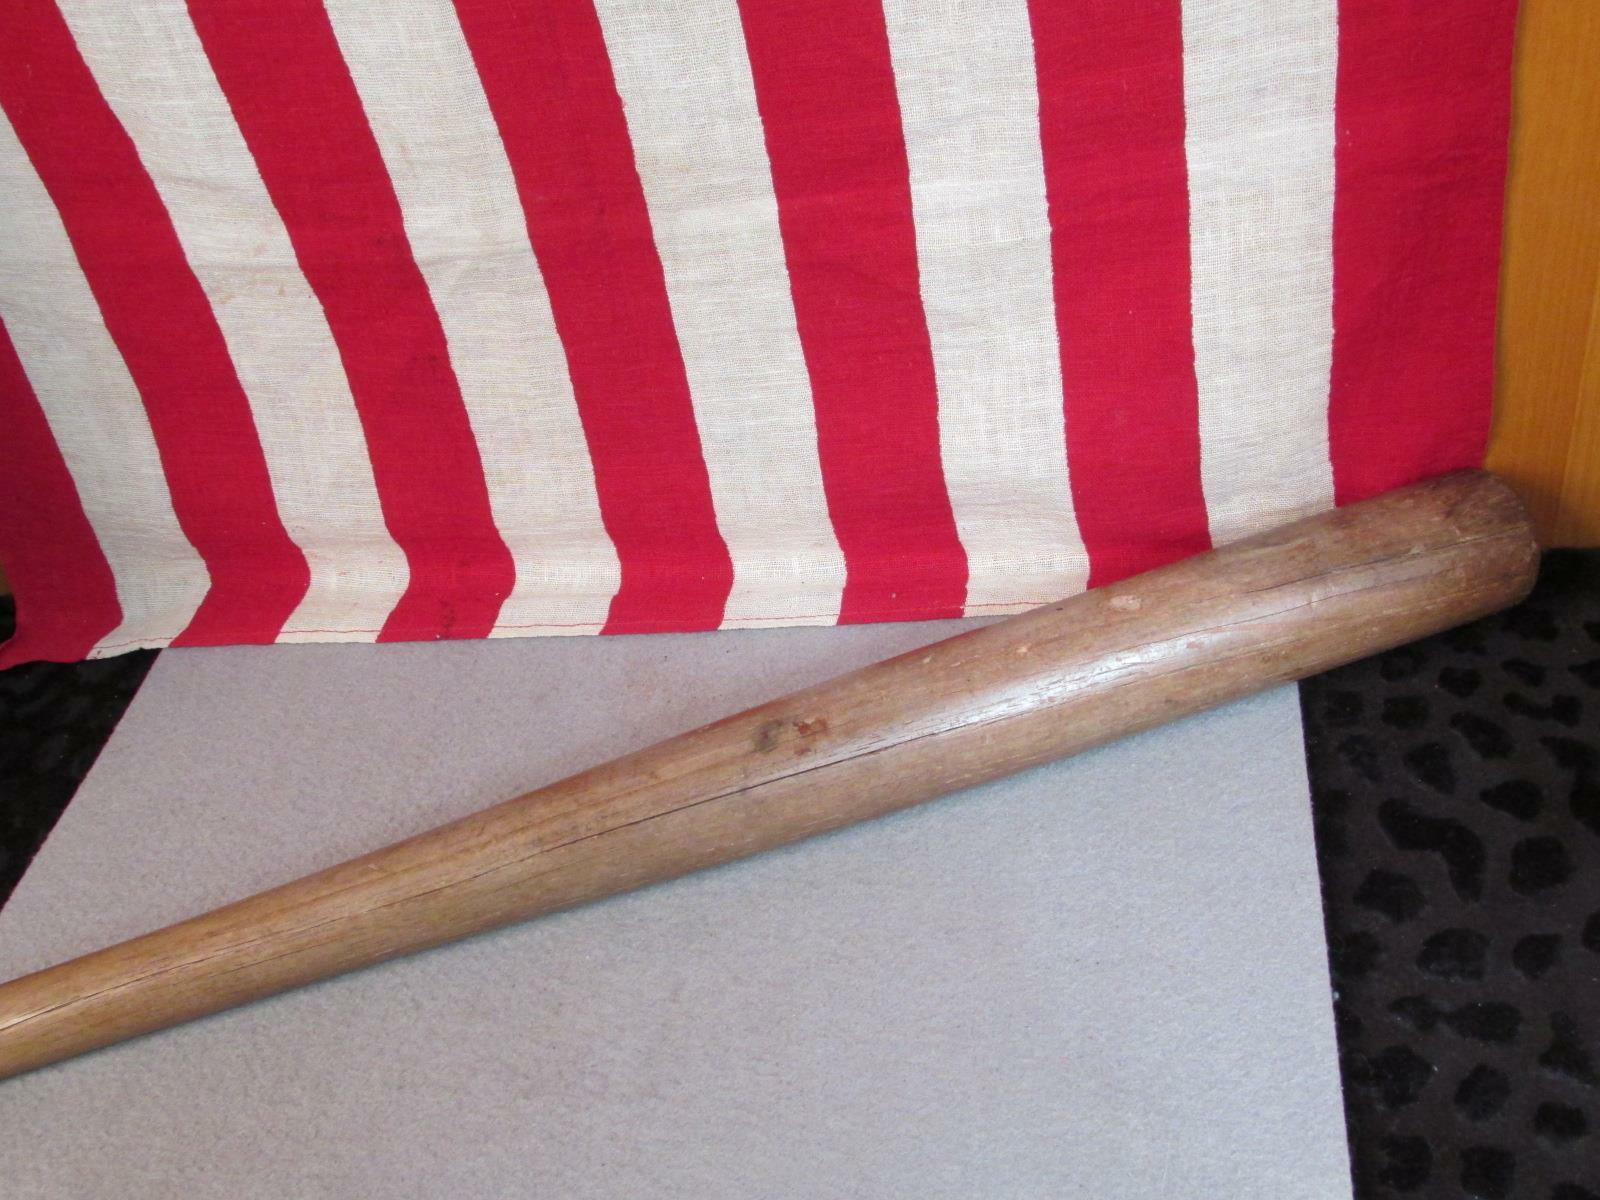 Vintage Fledermaus Rite Früh Holz Baseball Baseball Baseball Schläger Hanna Mfg Co Athen Ga. 33   0f097b